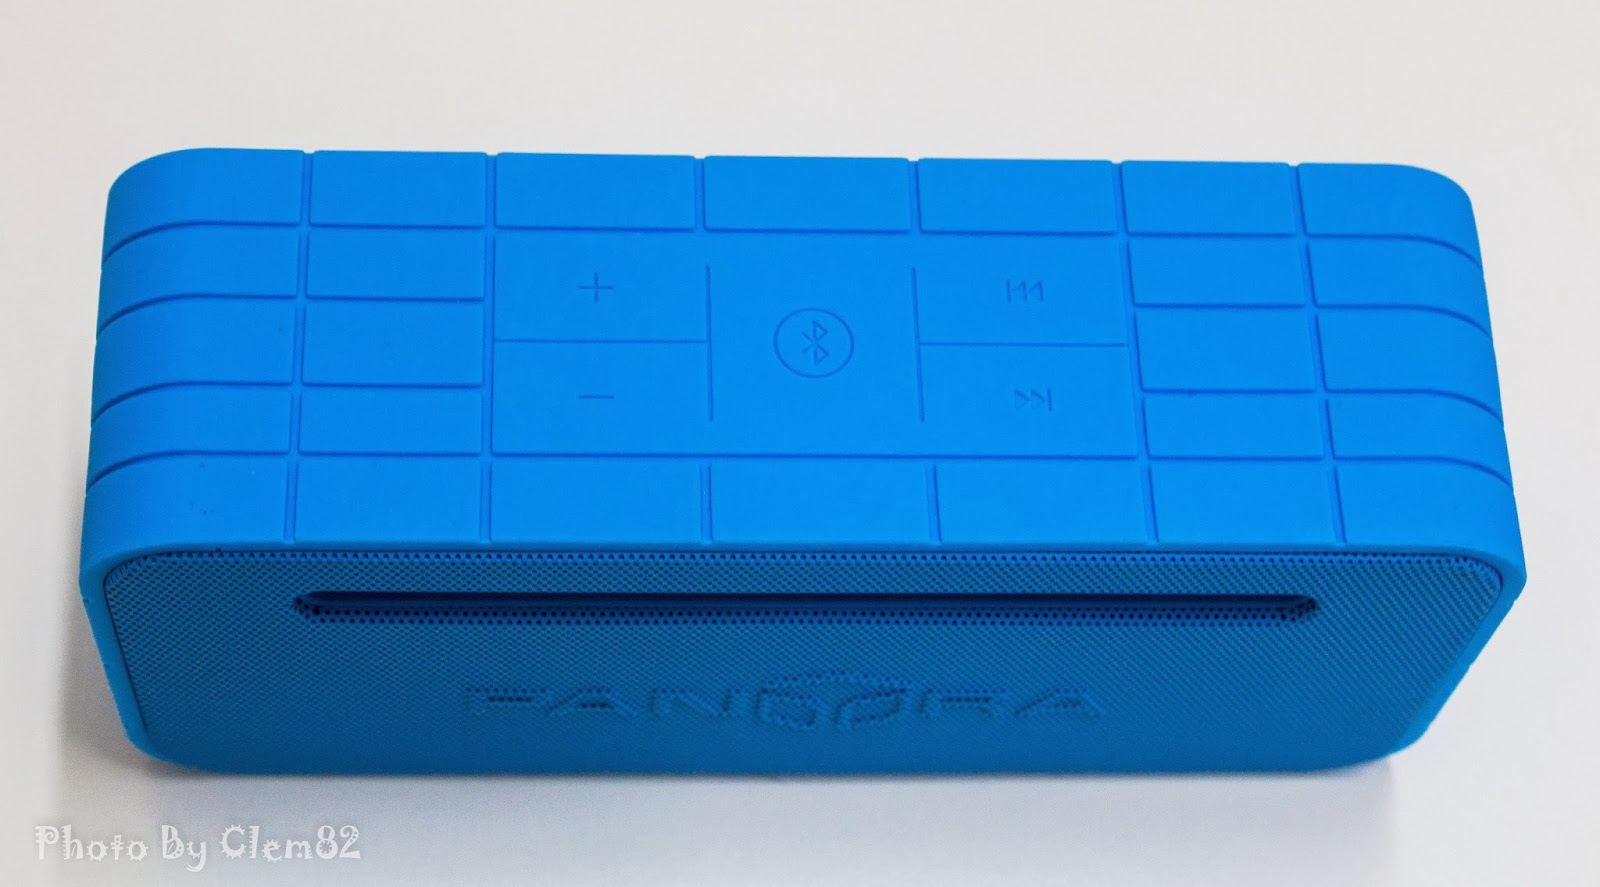 Opening Pandora's Box: SonicGear Pandora Wireless Bluetooth Media Player Series 17